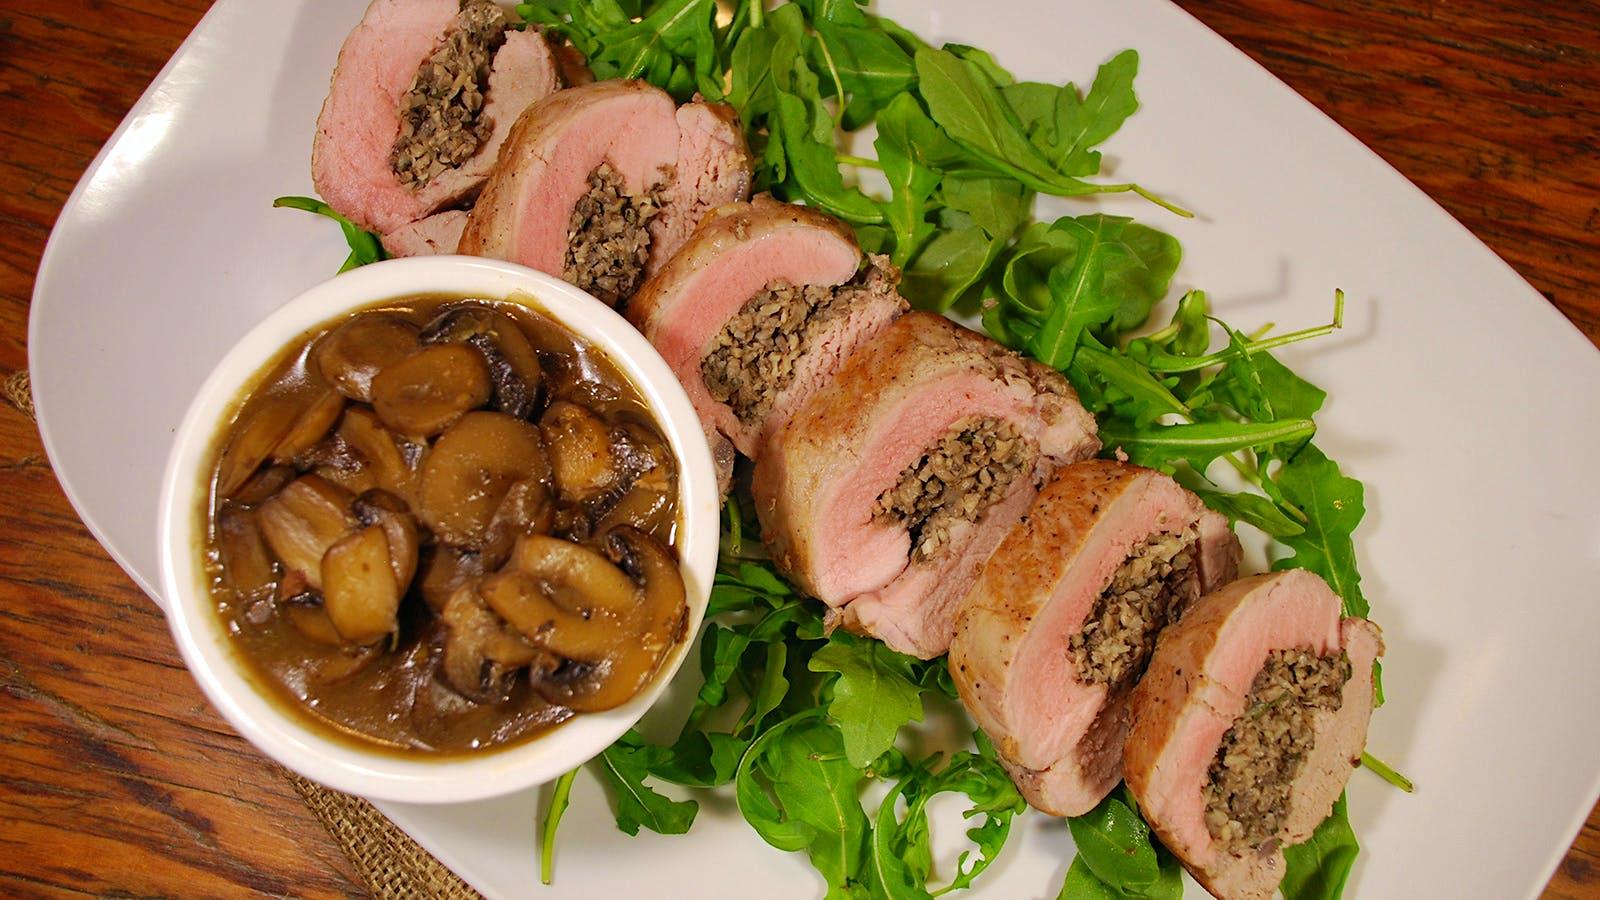 8 & $20 Recipe: Mushroom-Stuffed Pork Tenderloin